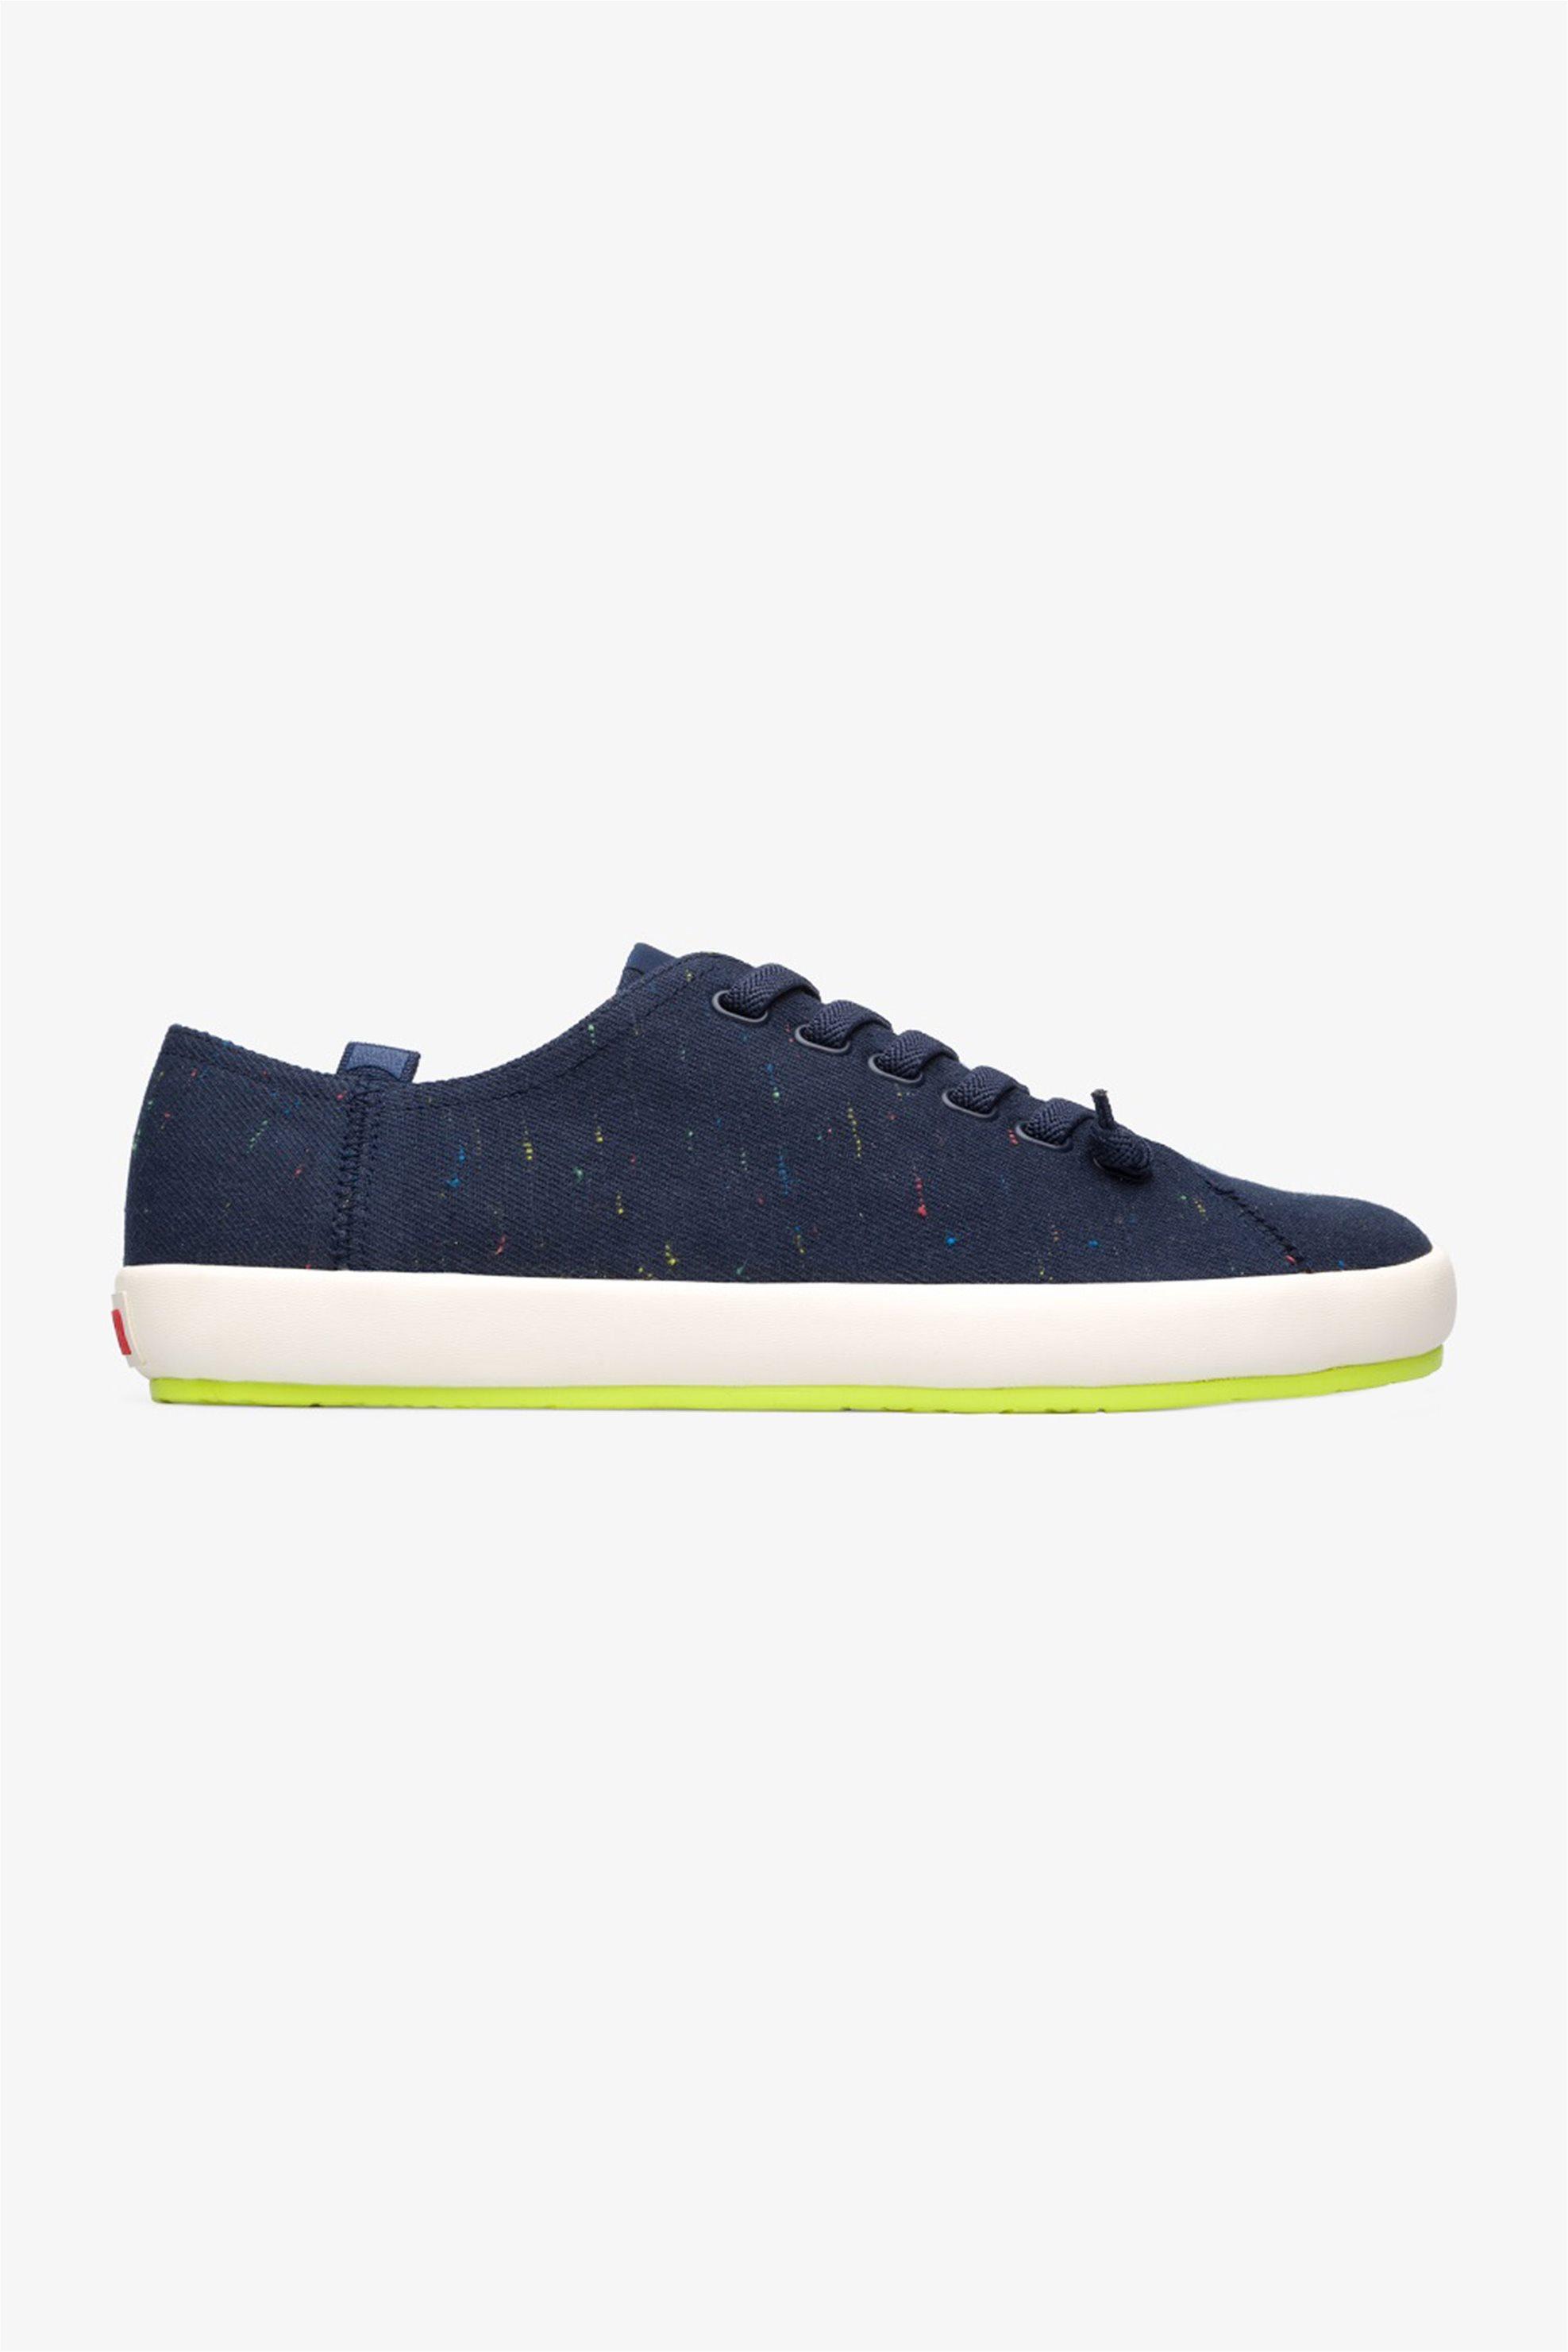 "Camper ανδρικά sneakers με ελαστικά κορδόνια ""Peu Rambla"" – 18869-072 – Μπλε Σκούρο"